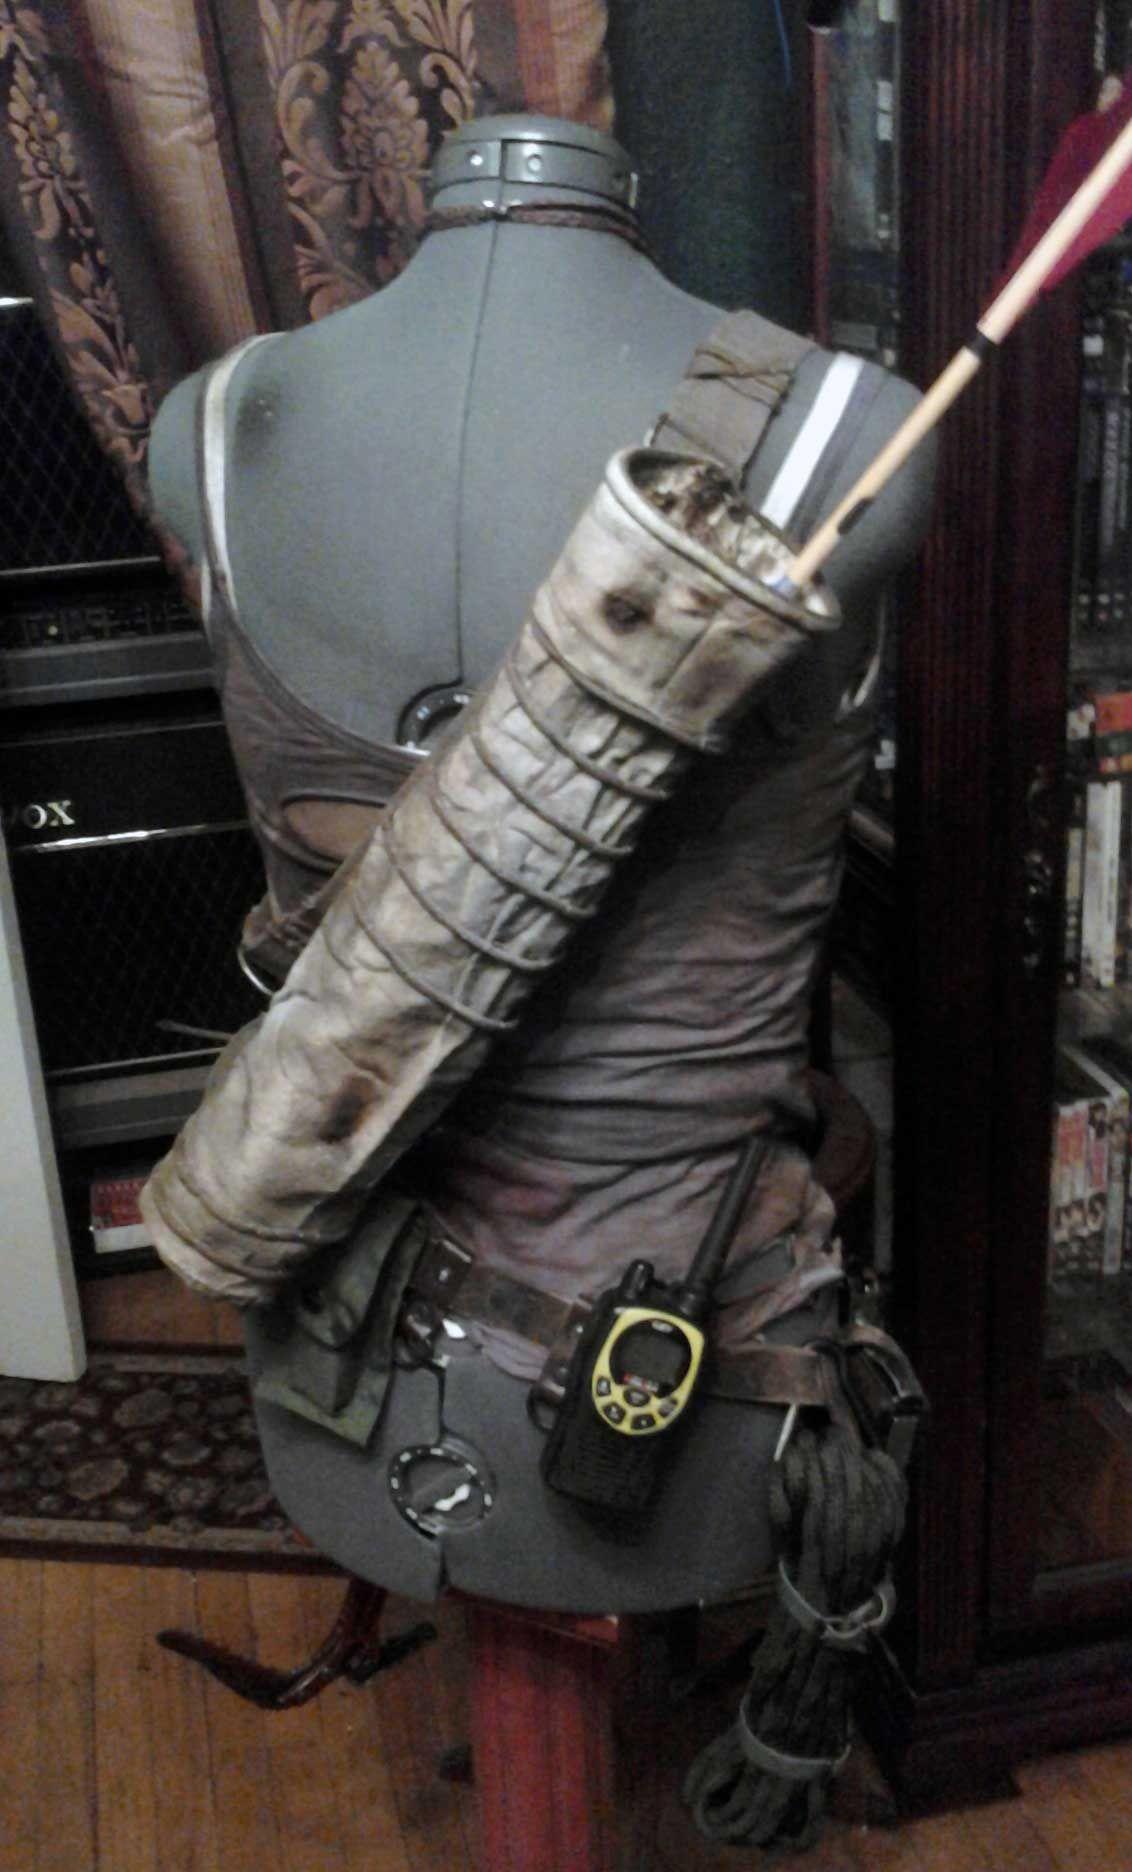 Lara croft cosplay tips and tricks by kristen tomb raider blog halloween pinterest - Tomb raider deguisement ...